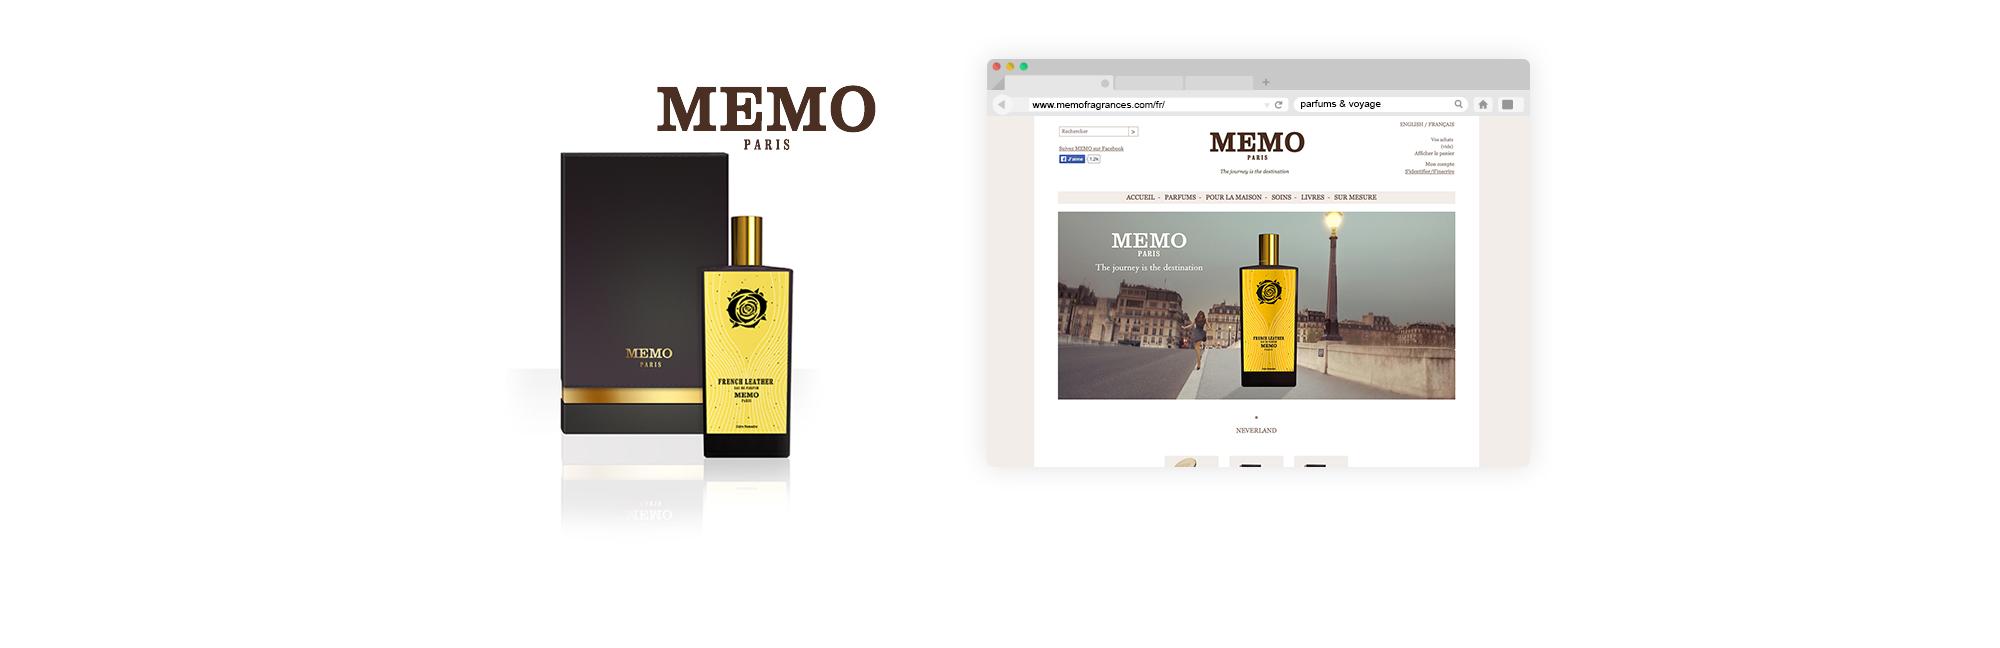 24-slide-memo-fragrances-parfum